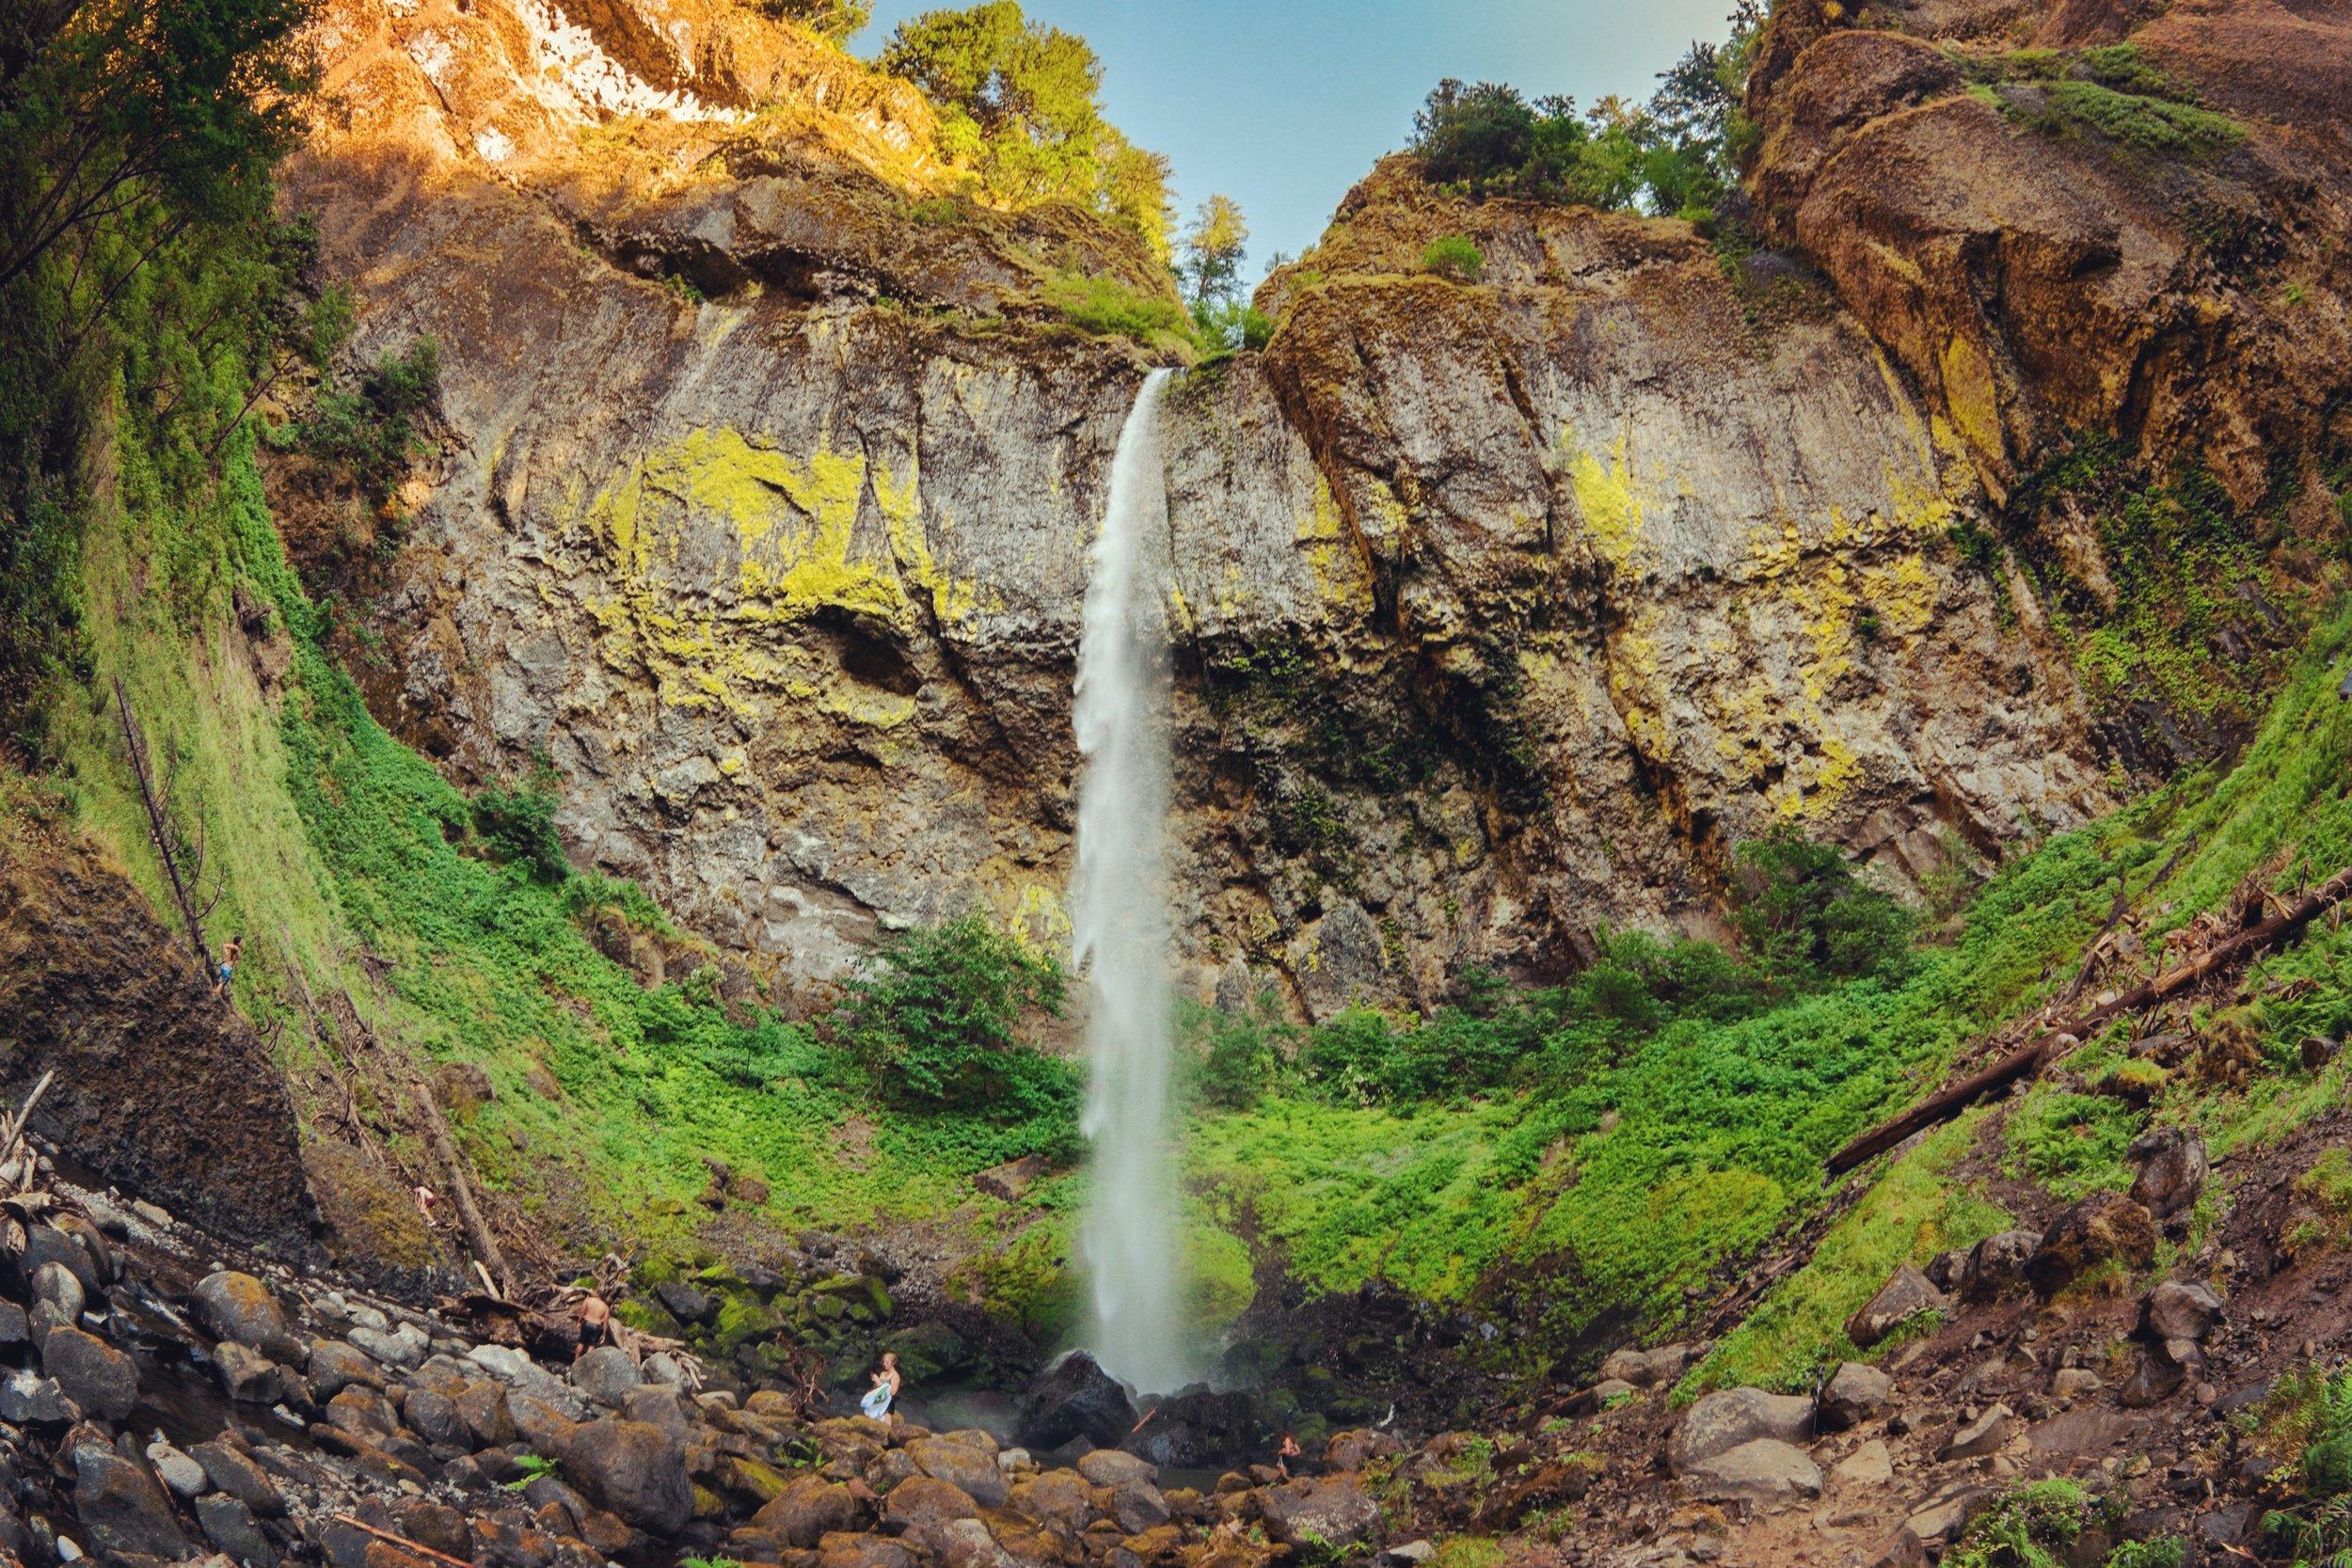 Wasim Muklashy Photography_Wasim of Nazareth Photography_Pacific Northwest_Oregon Washington_Months 1-3 Highlights_048.jpg